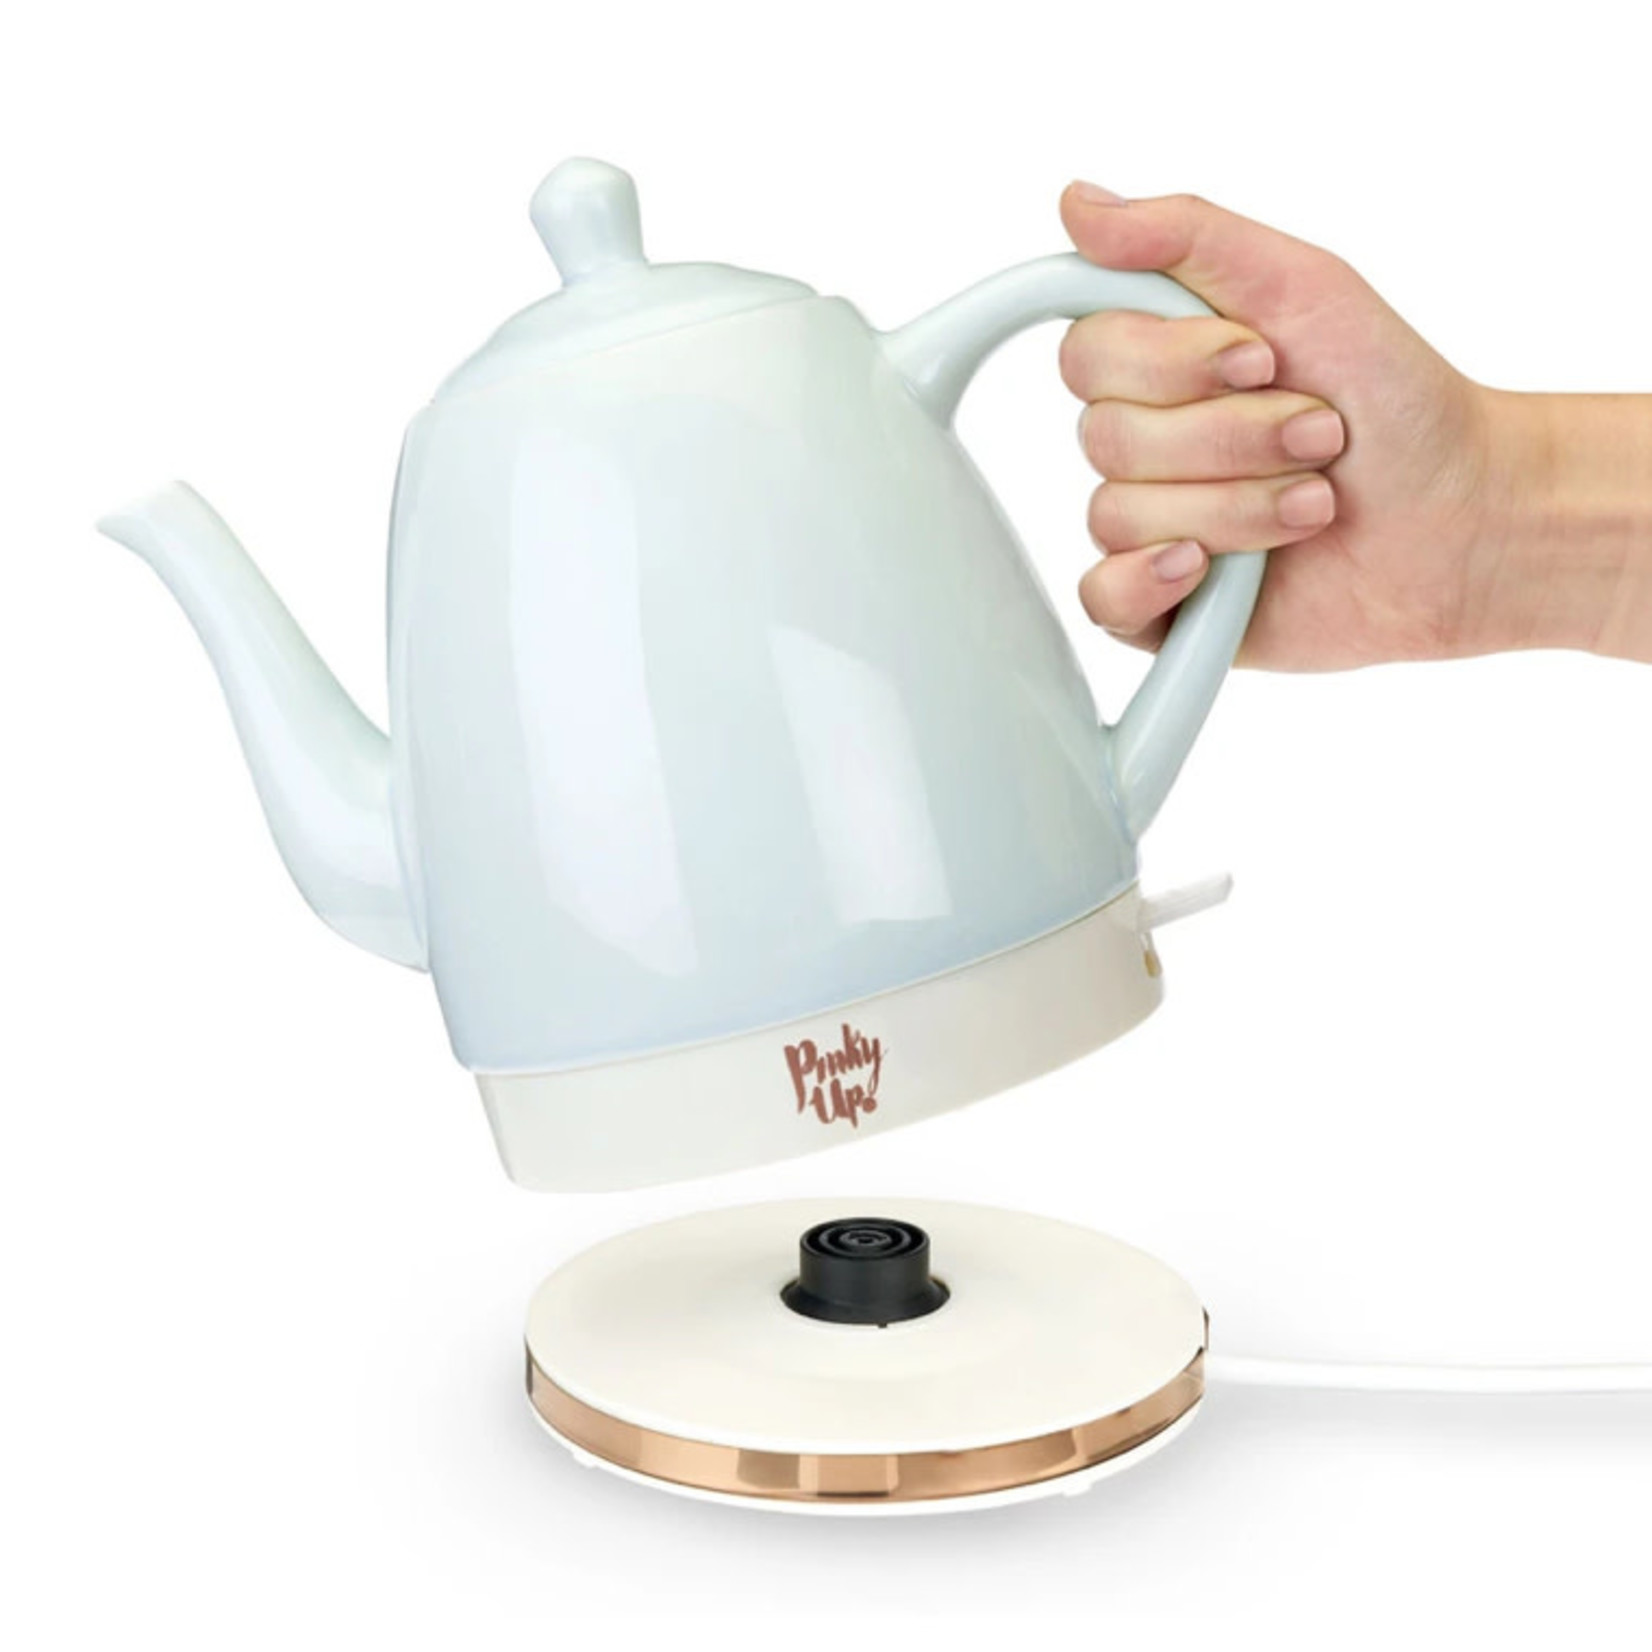 Pinky Up Noelle Ceramic Electric Tea Kettle